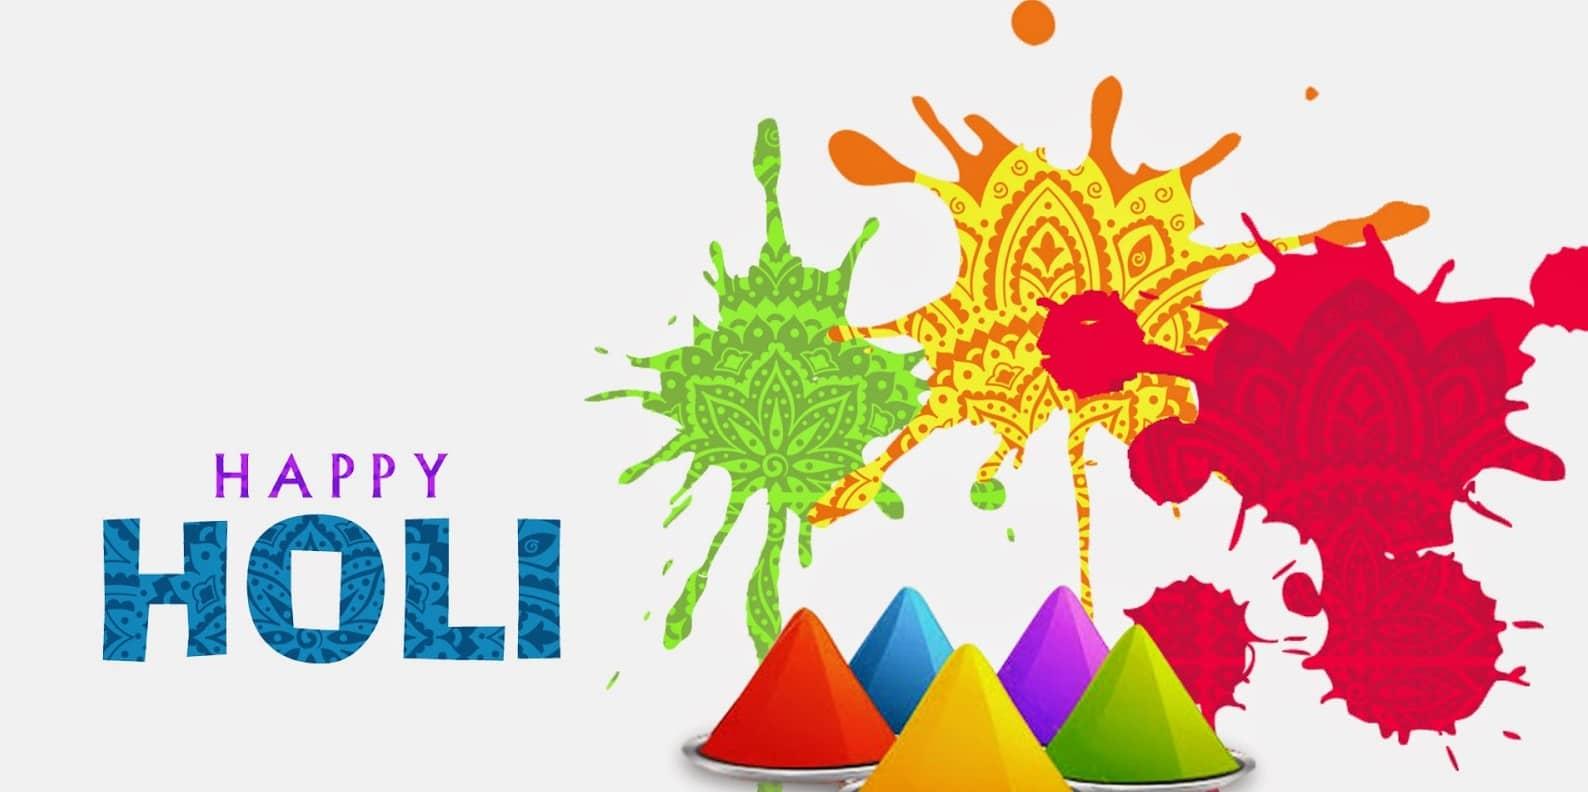 Images of Happy Holi Wishes